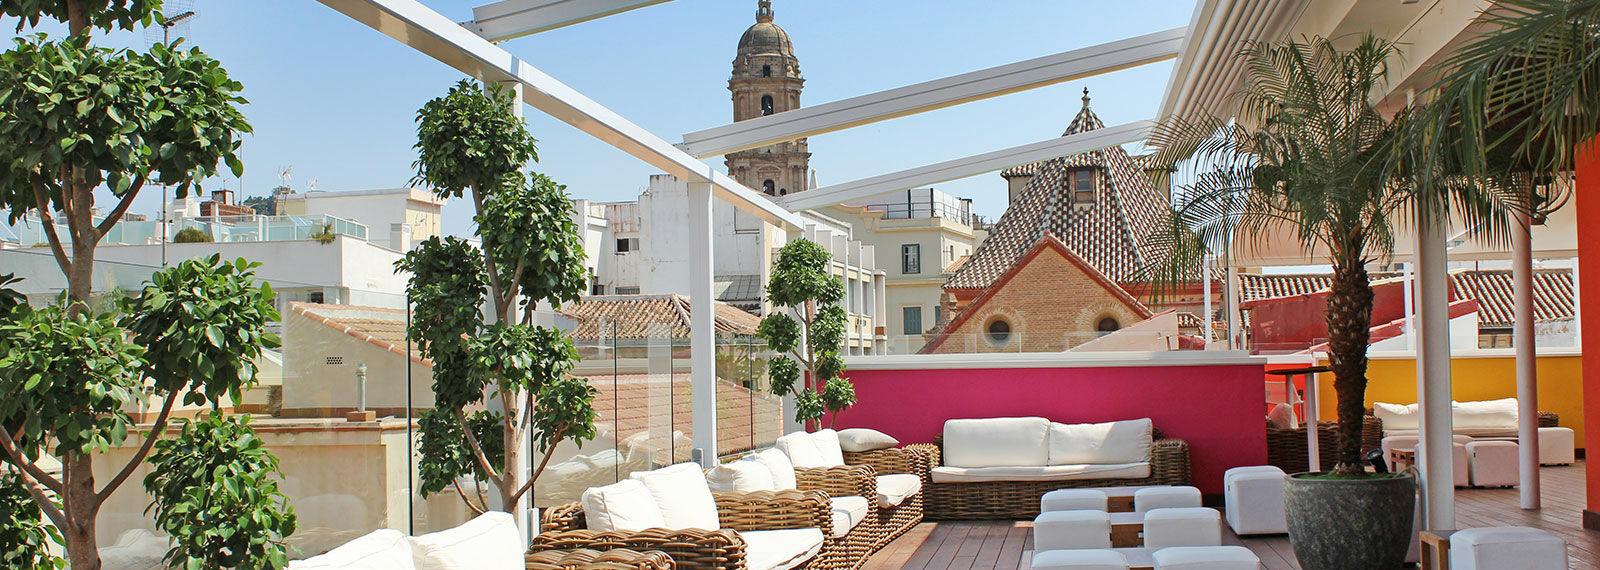 Rooftop terrace Malaga